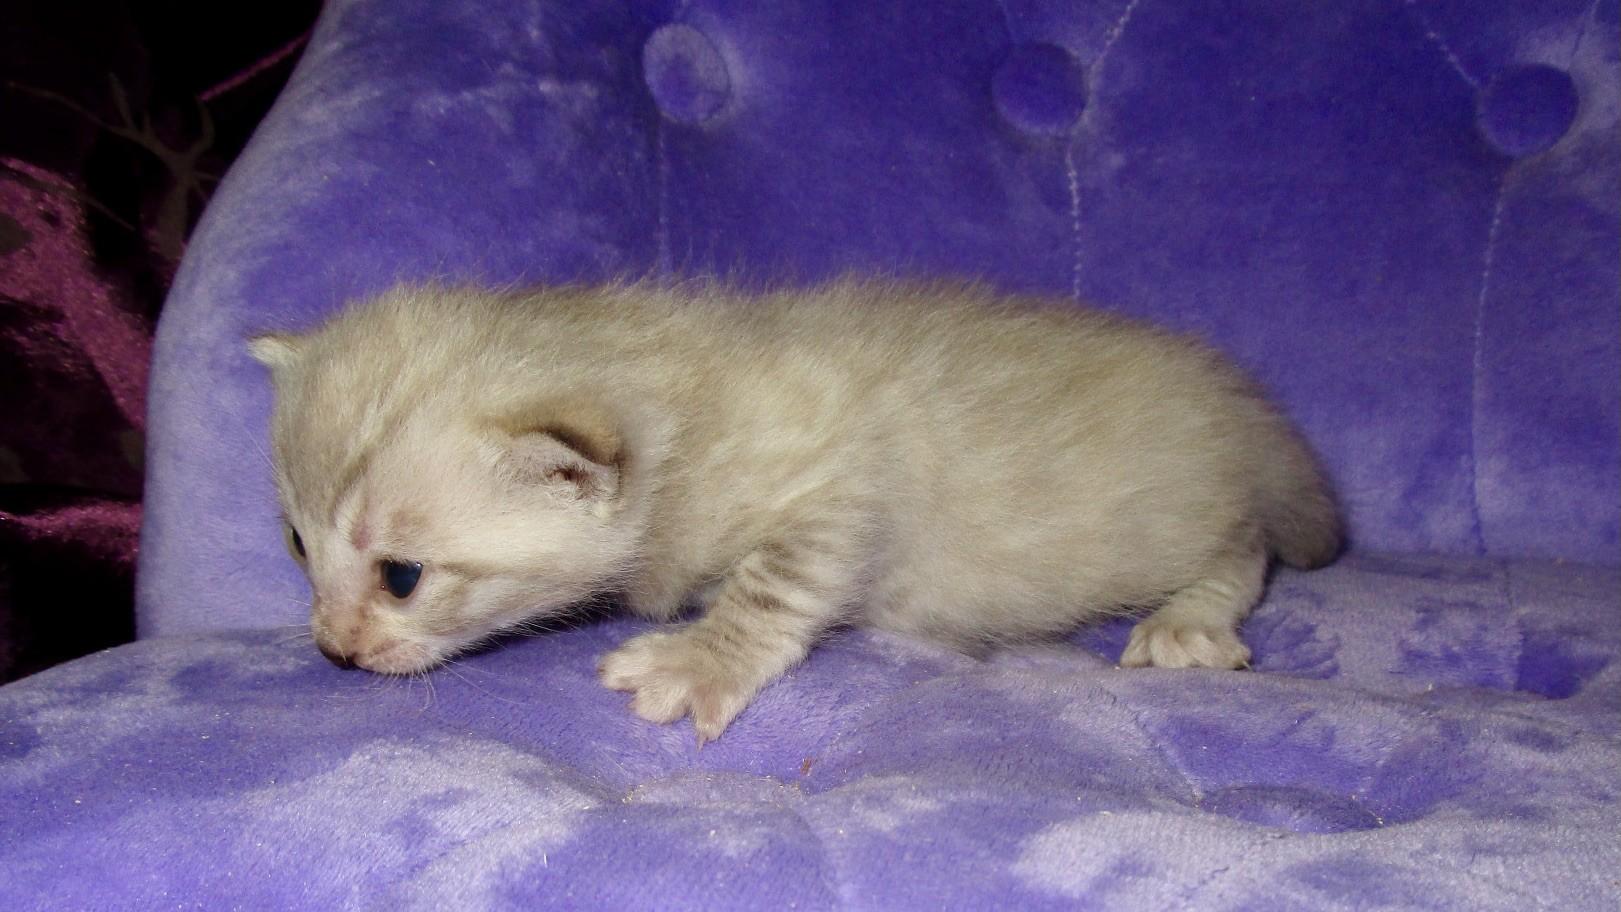 Femelle 1 - 3 semaines